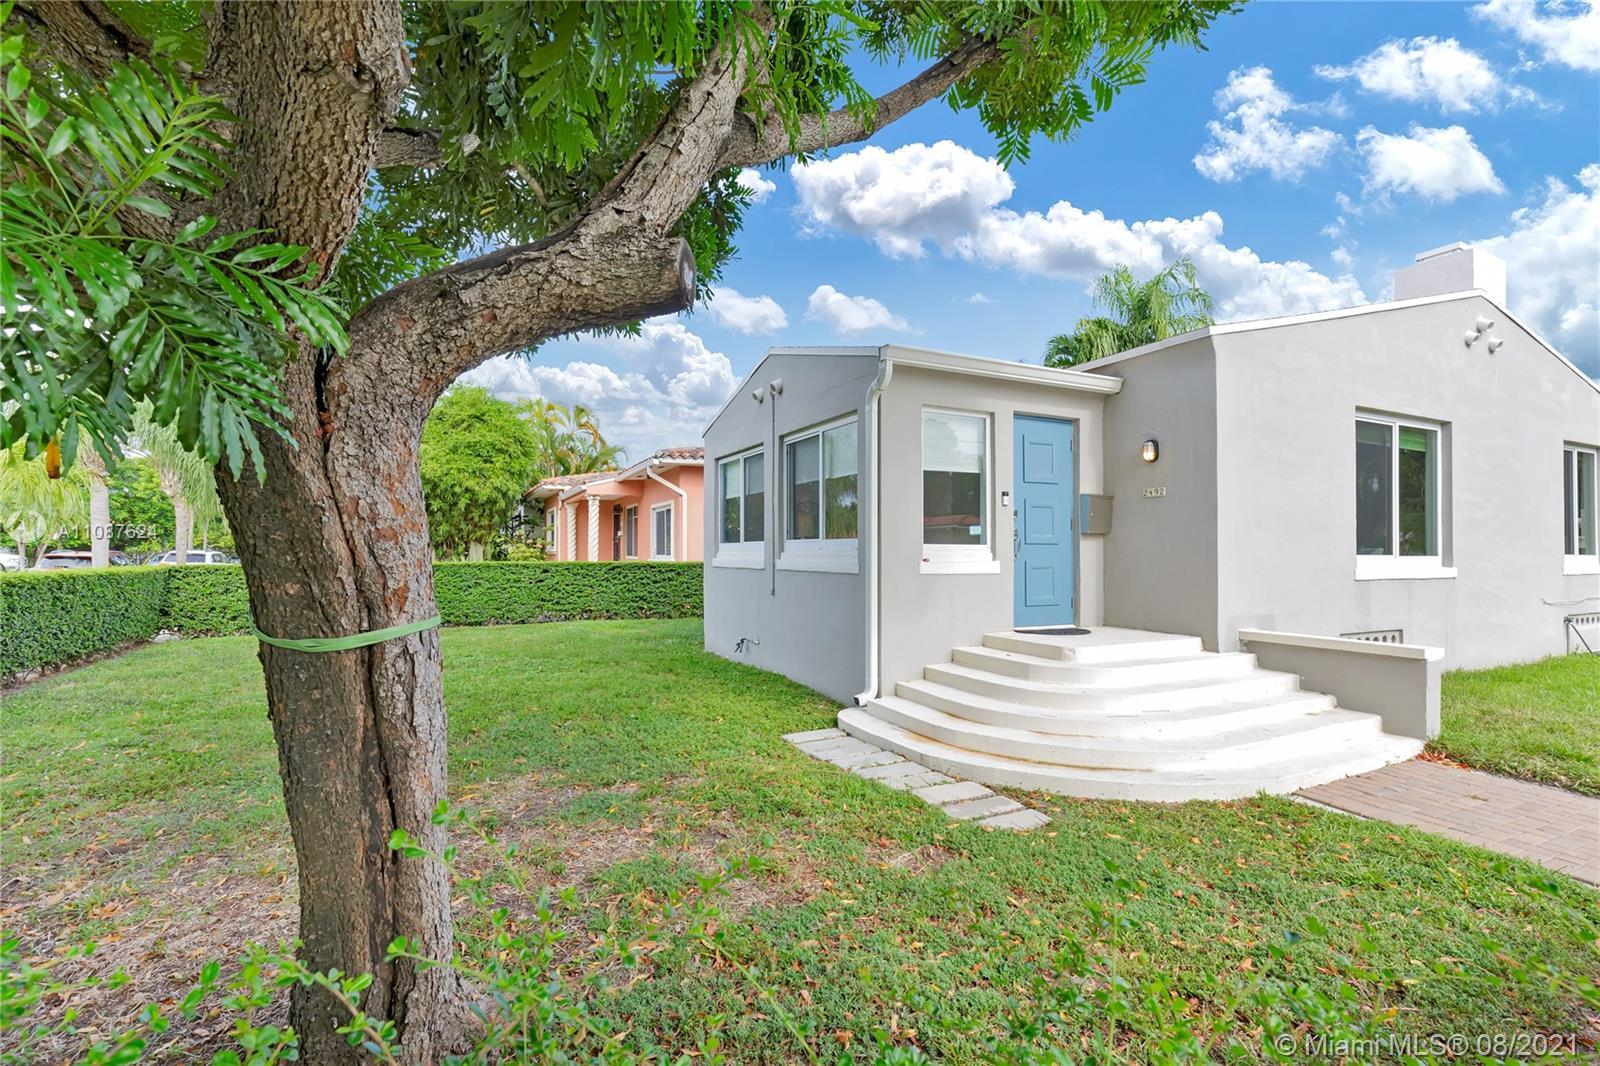 Silver Bluff - 2492 SW 23rd St, Miami, FL 33145